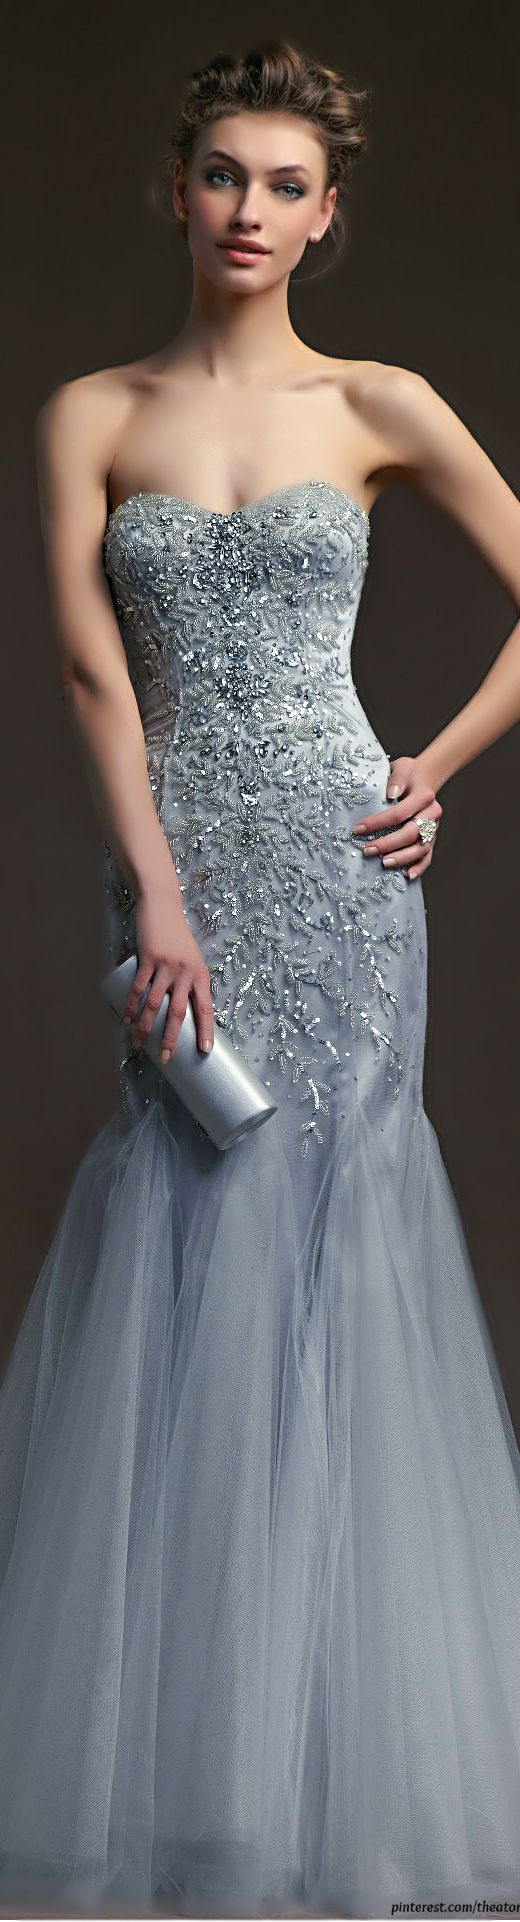 elegant beading, sweetheart neckline wih mermaid style in silver. #dress gorgeous